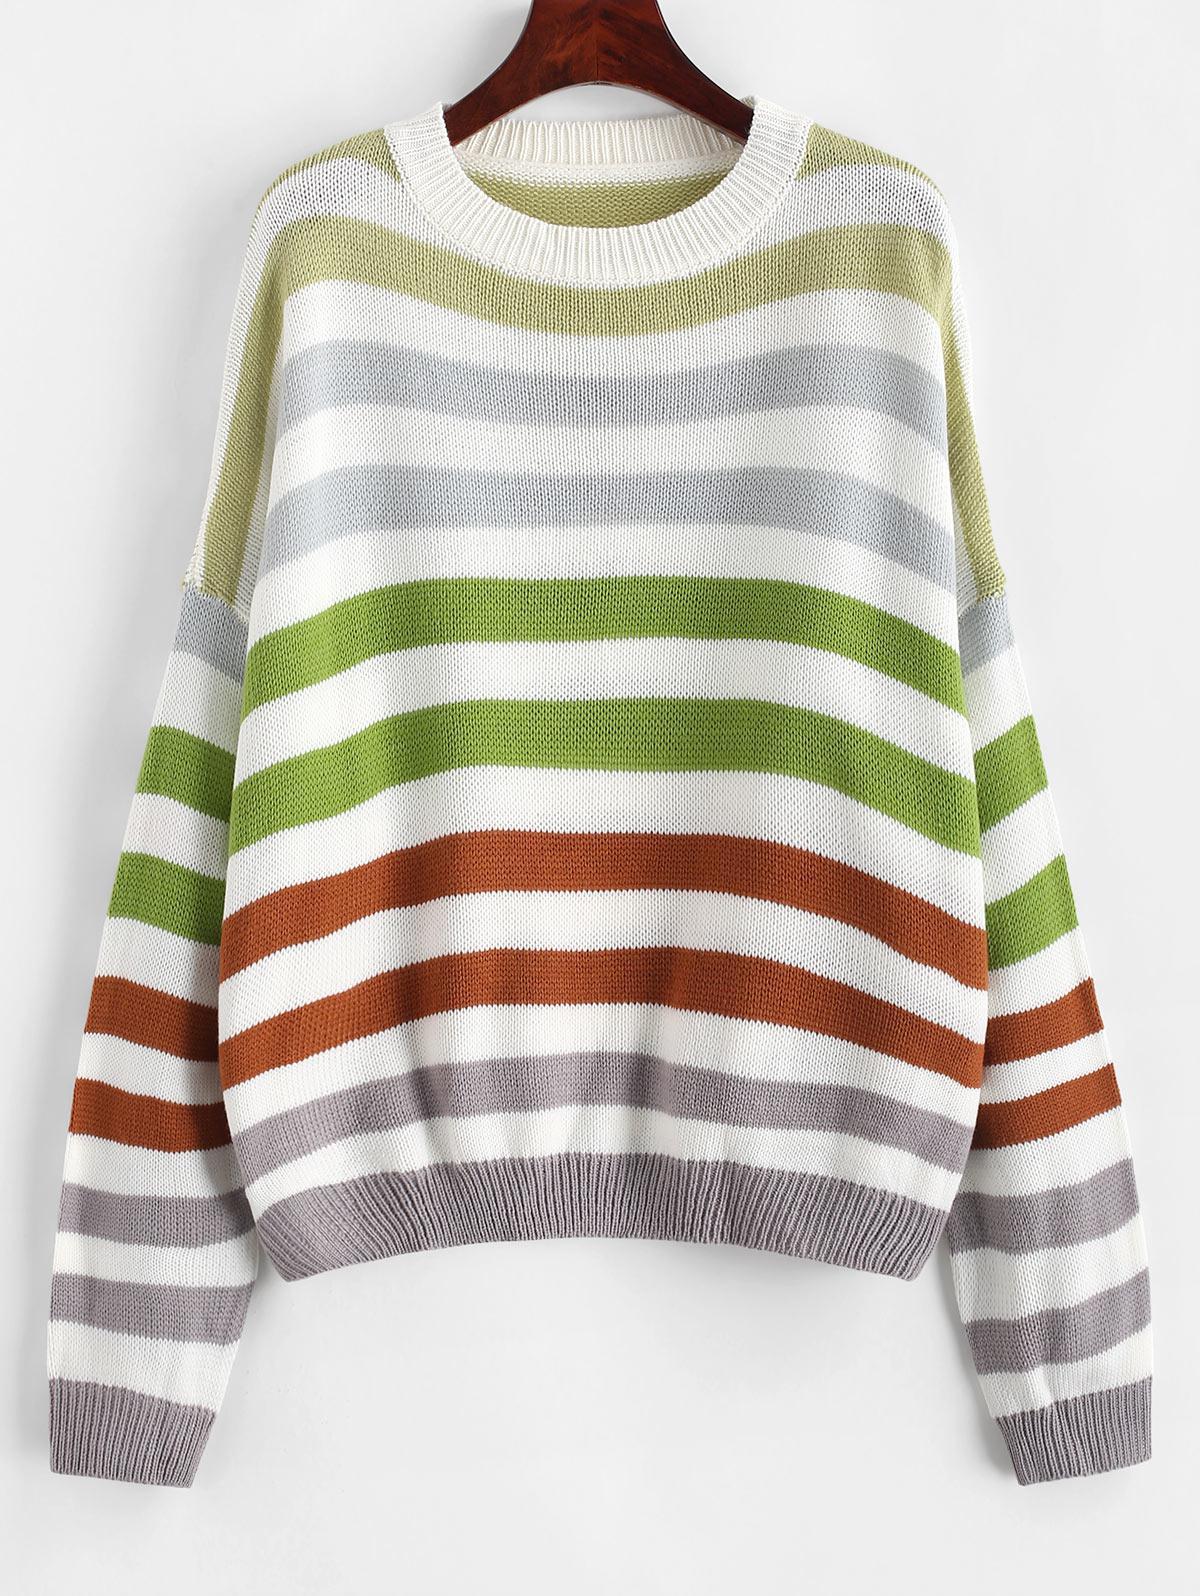 Contrast Striped Loose Crew Neck Sweater